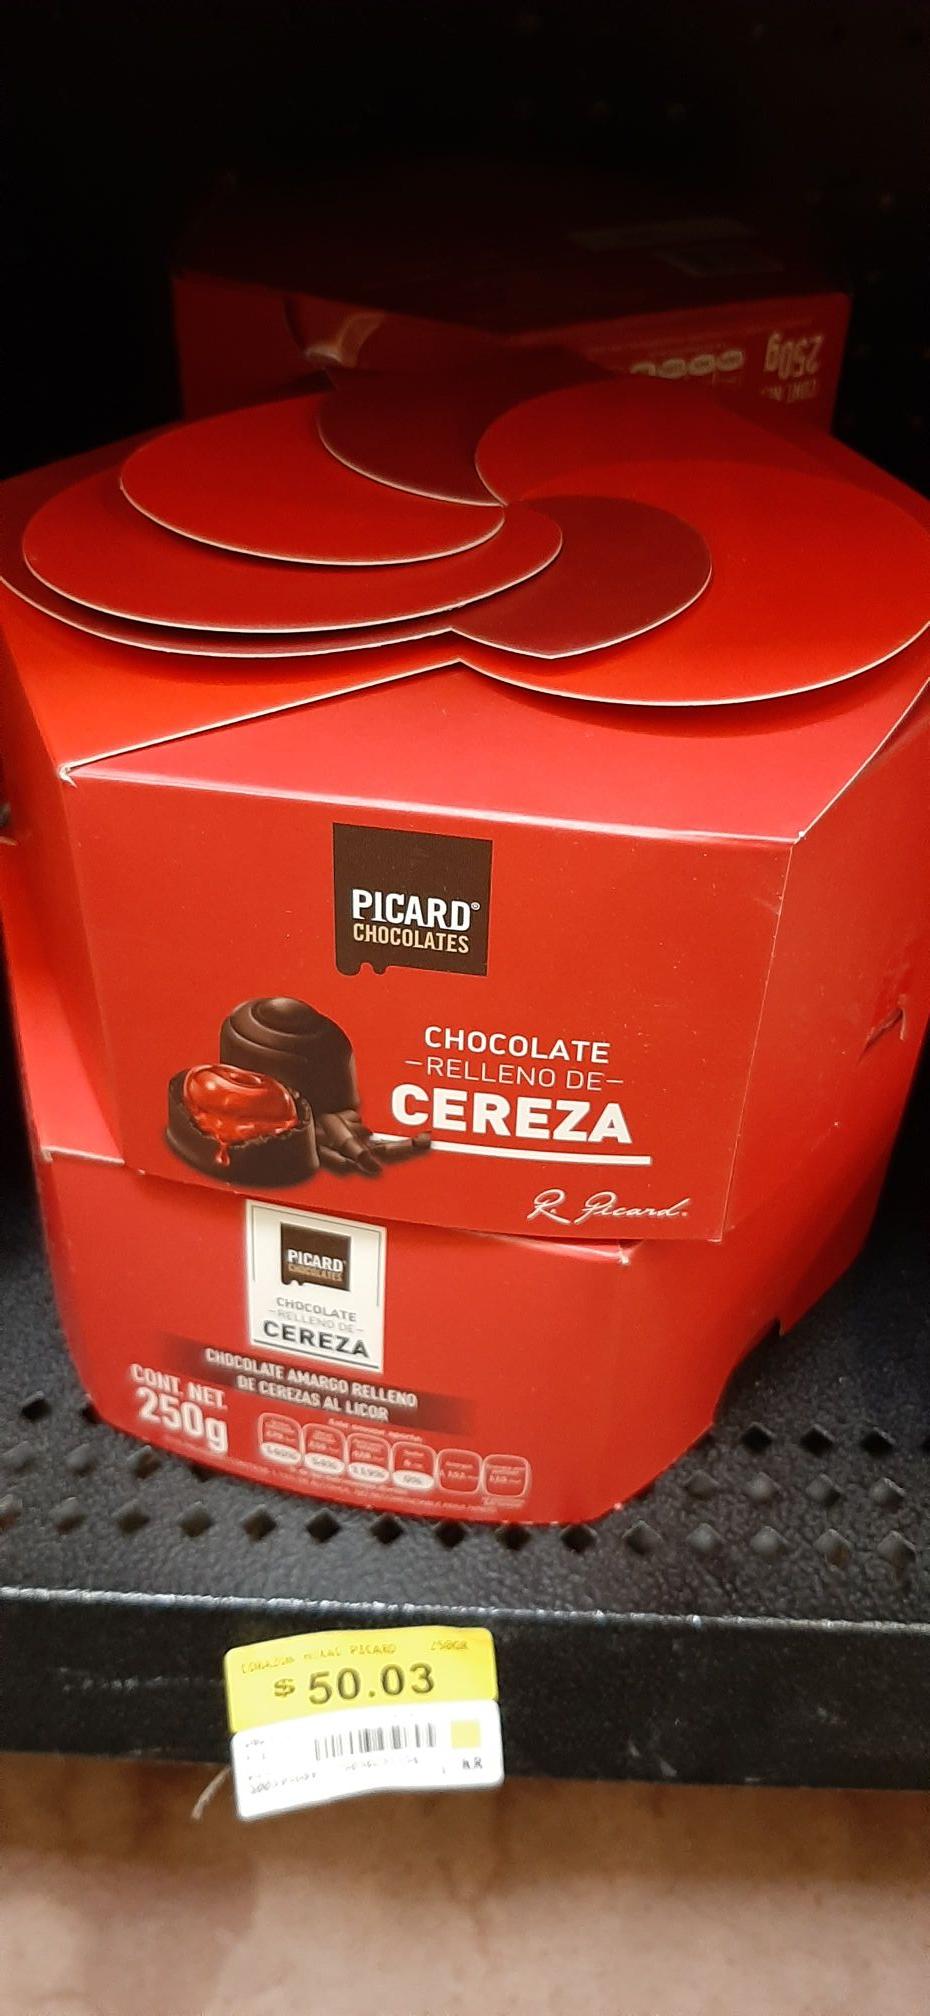 Walmart: Chocolate Picard relleno de cereza, 250 g